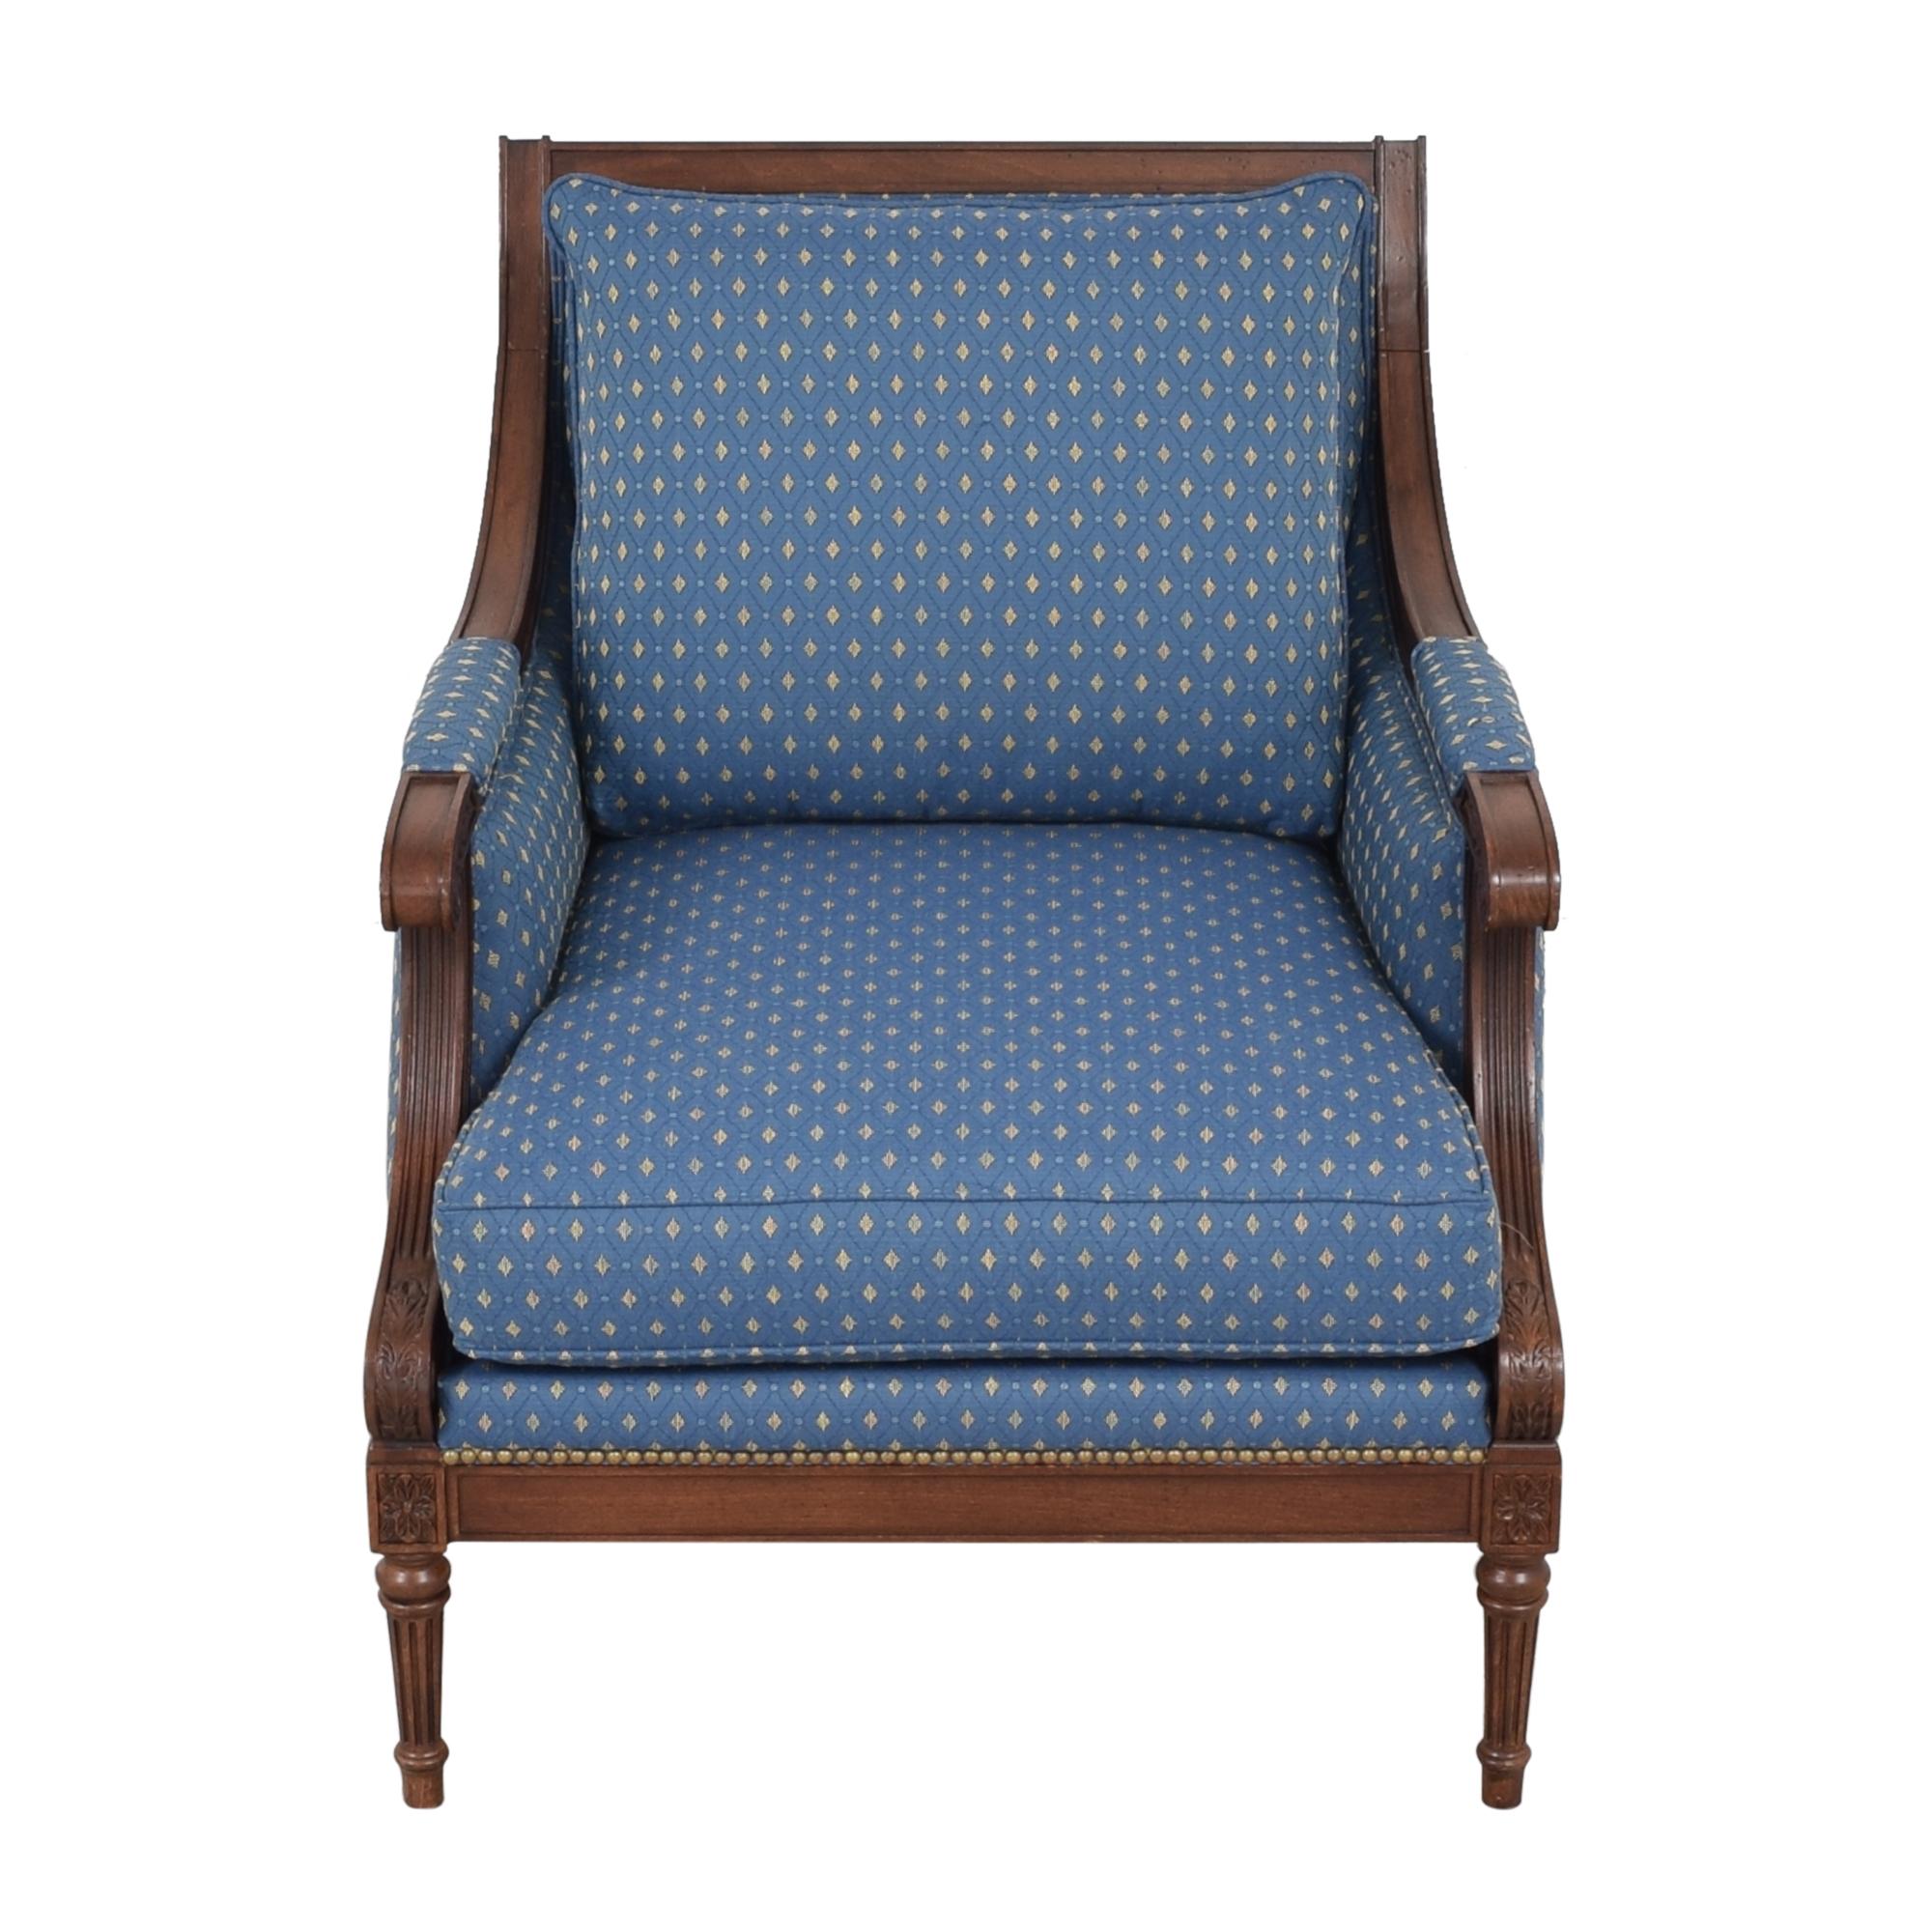 Ethan Allen Ethan Allen Accent Chair Accent Chairs